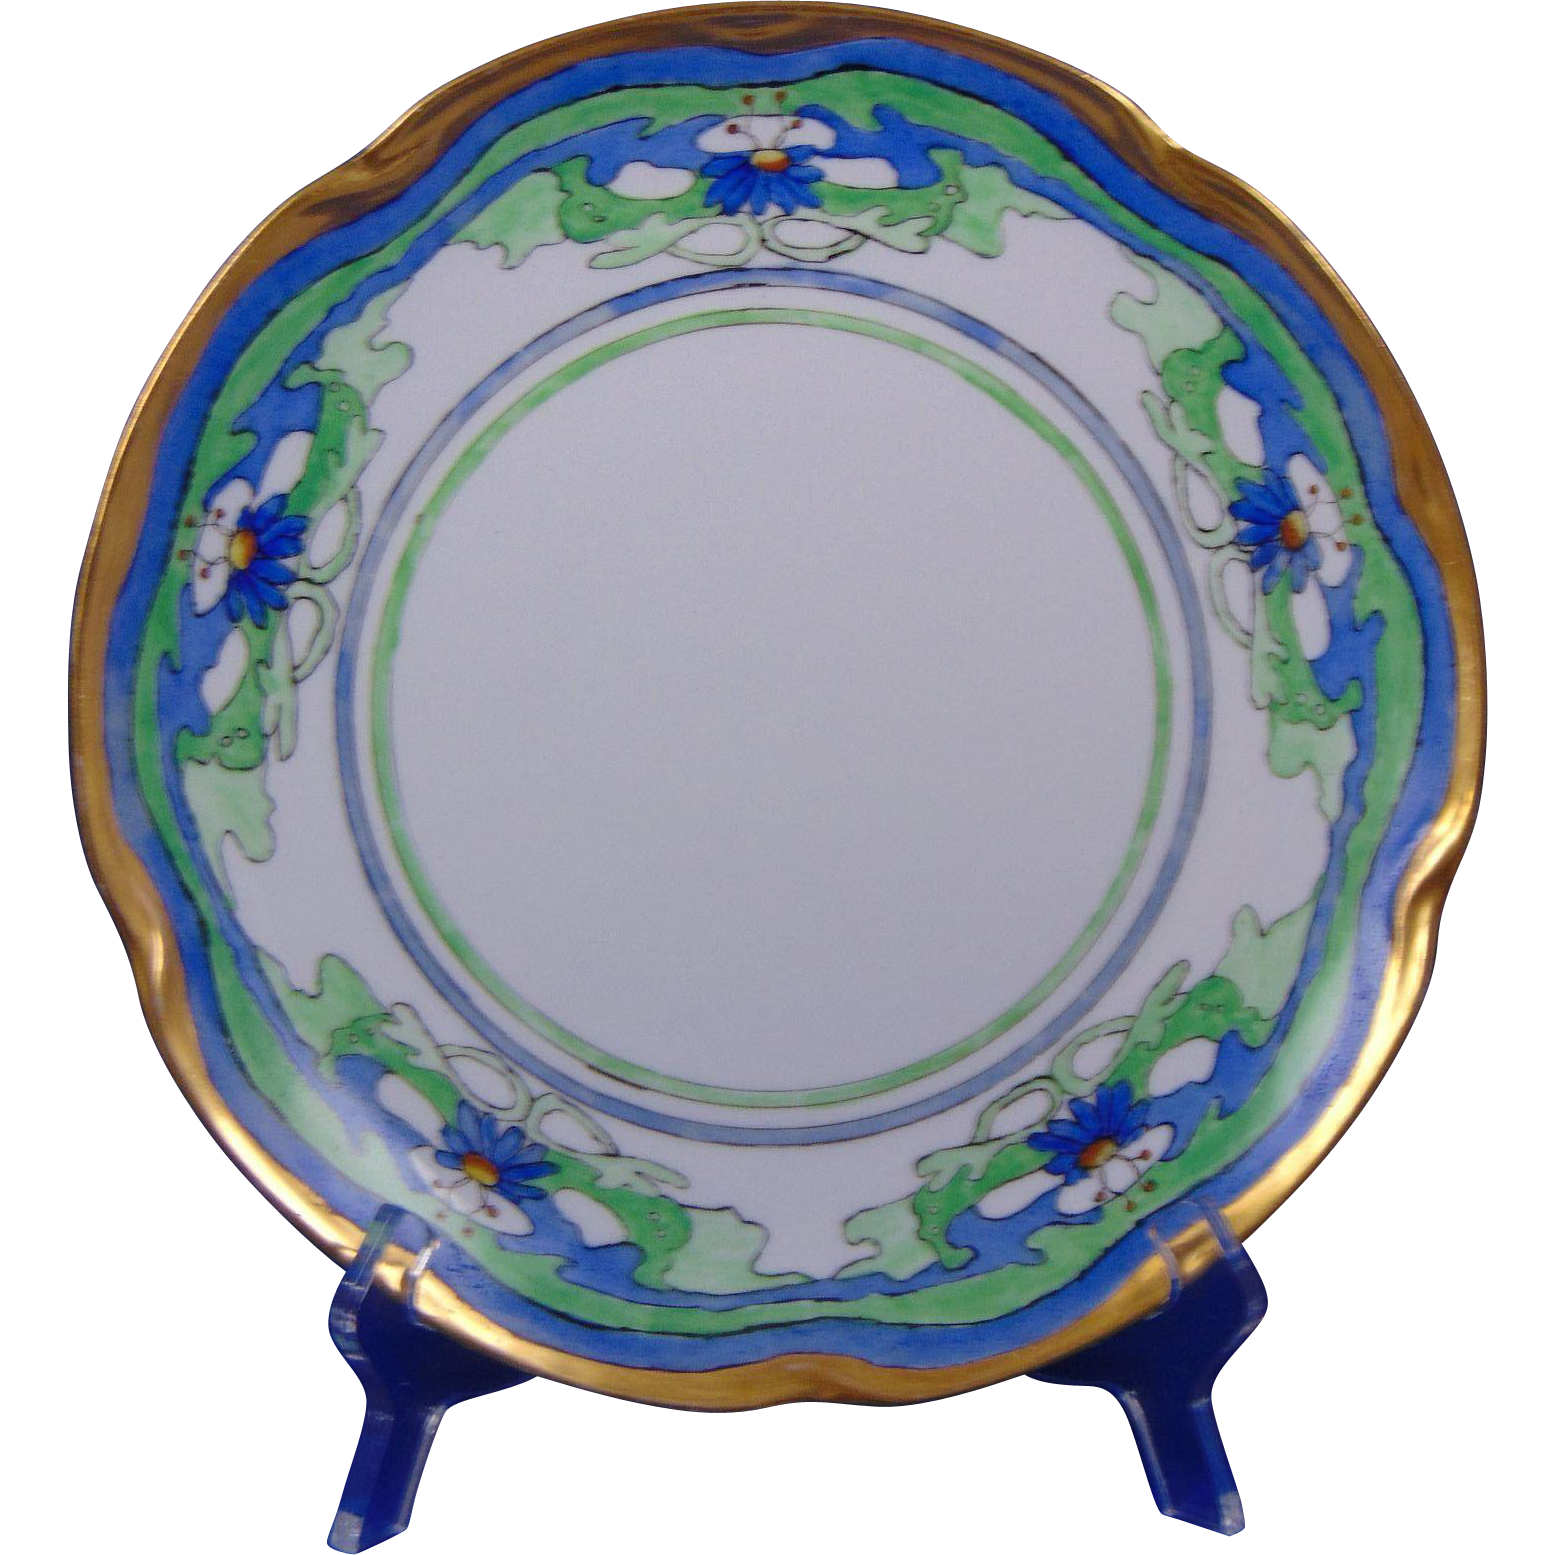 Jaeger & Co. Bavaria Arts & Crafts Floral Motif Plate (Signed/c.1909-1930) - Keramic Studio Design